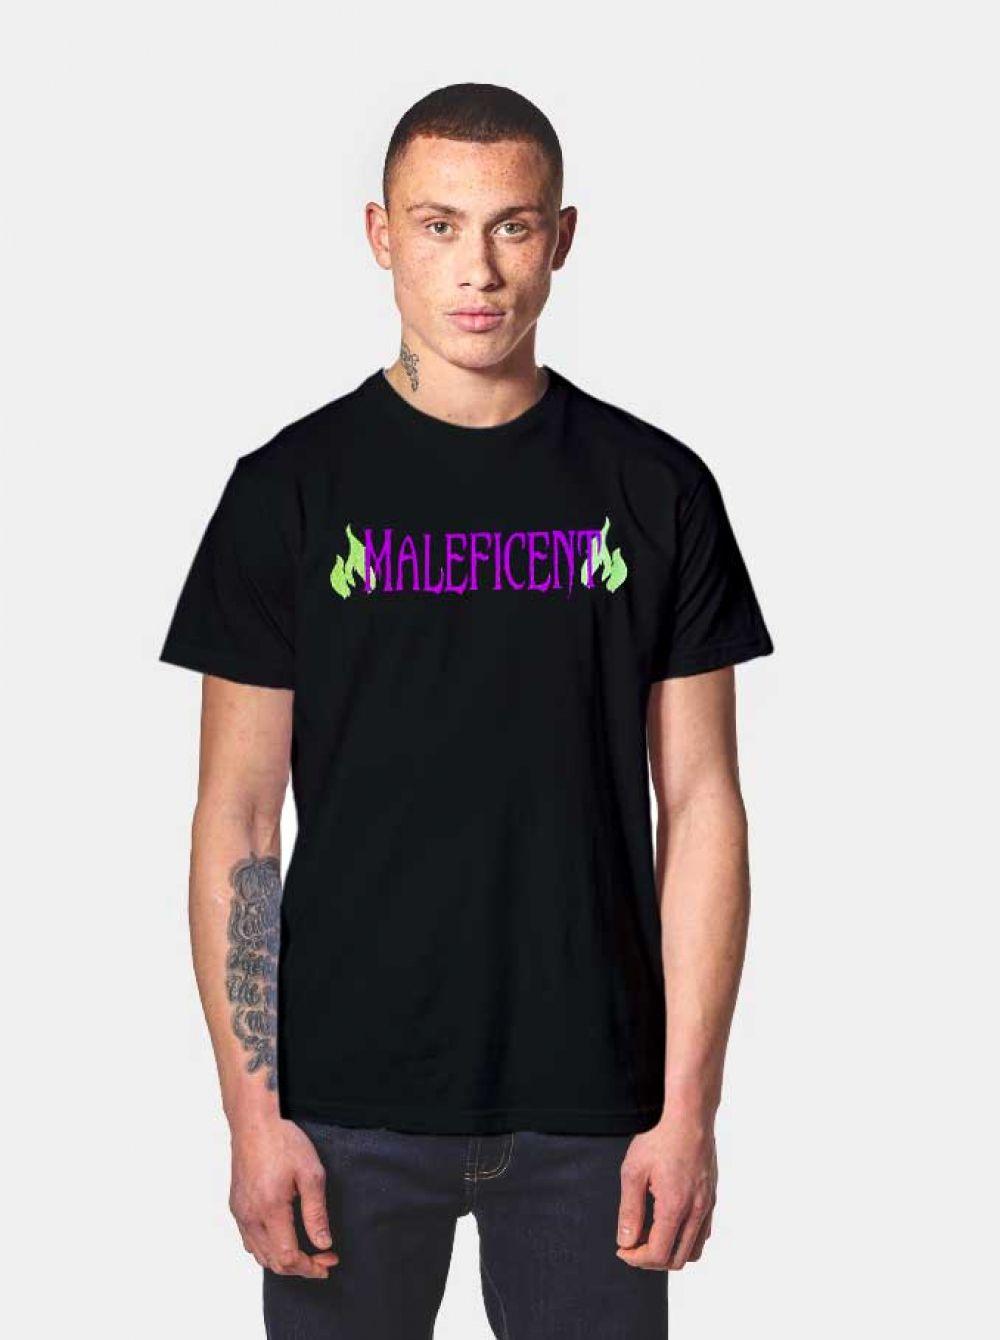 Maleficent Villain Disney T Shirt Maleficent Villain Disney T Shirt $ 14.50